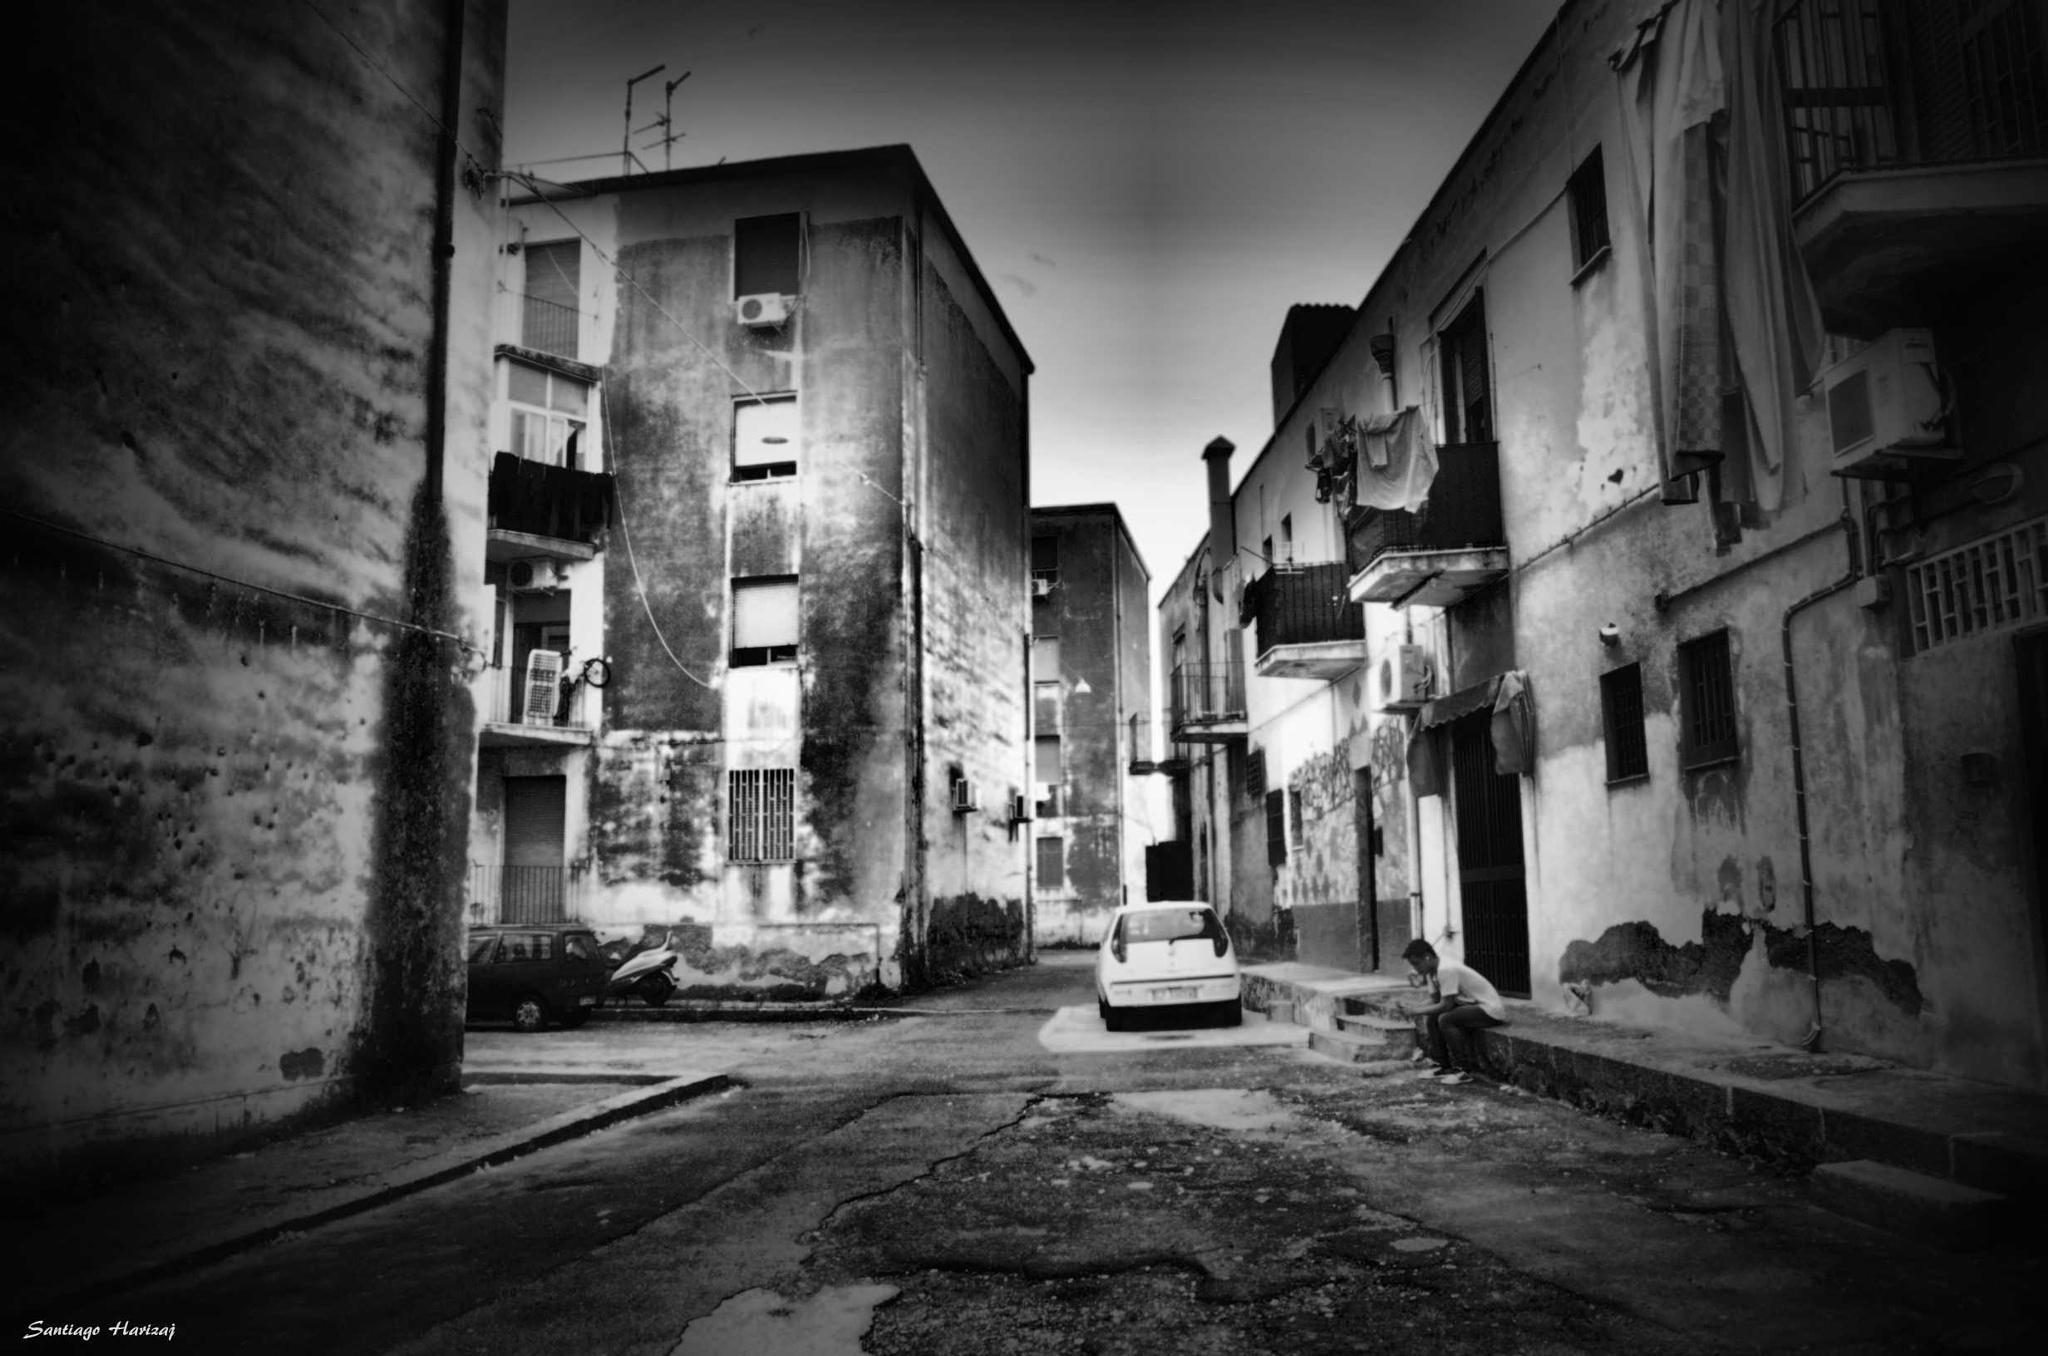 Untitled by Santiago Harizaj